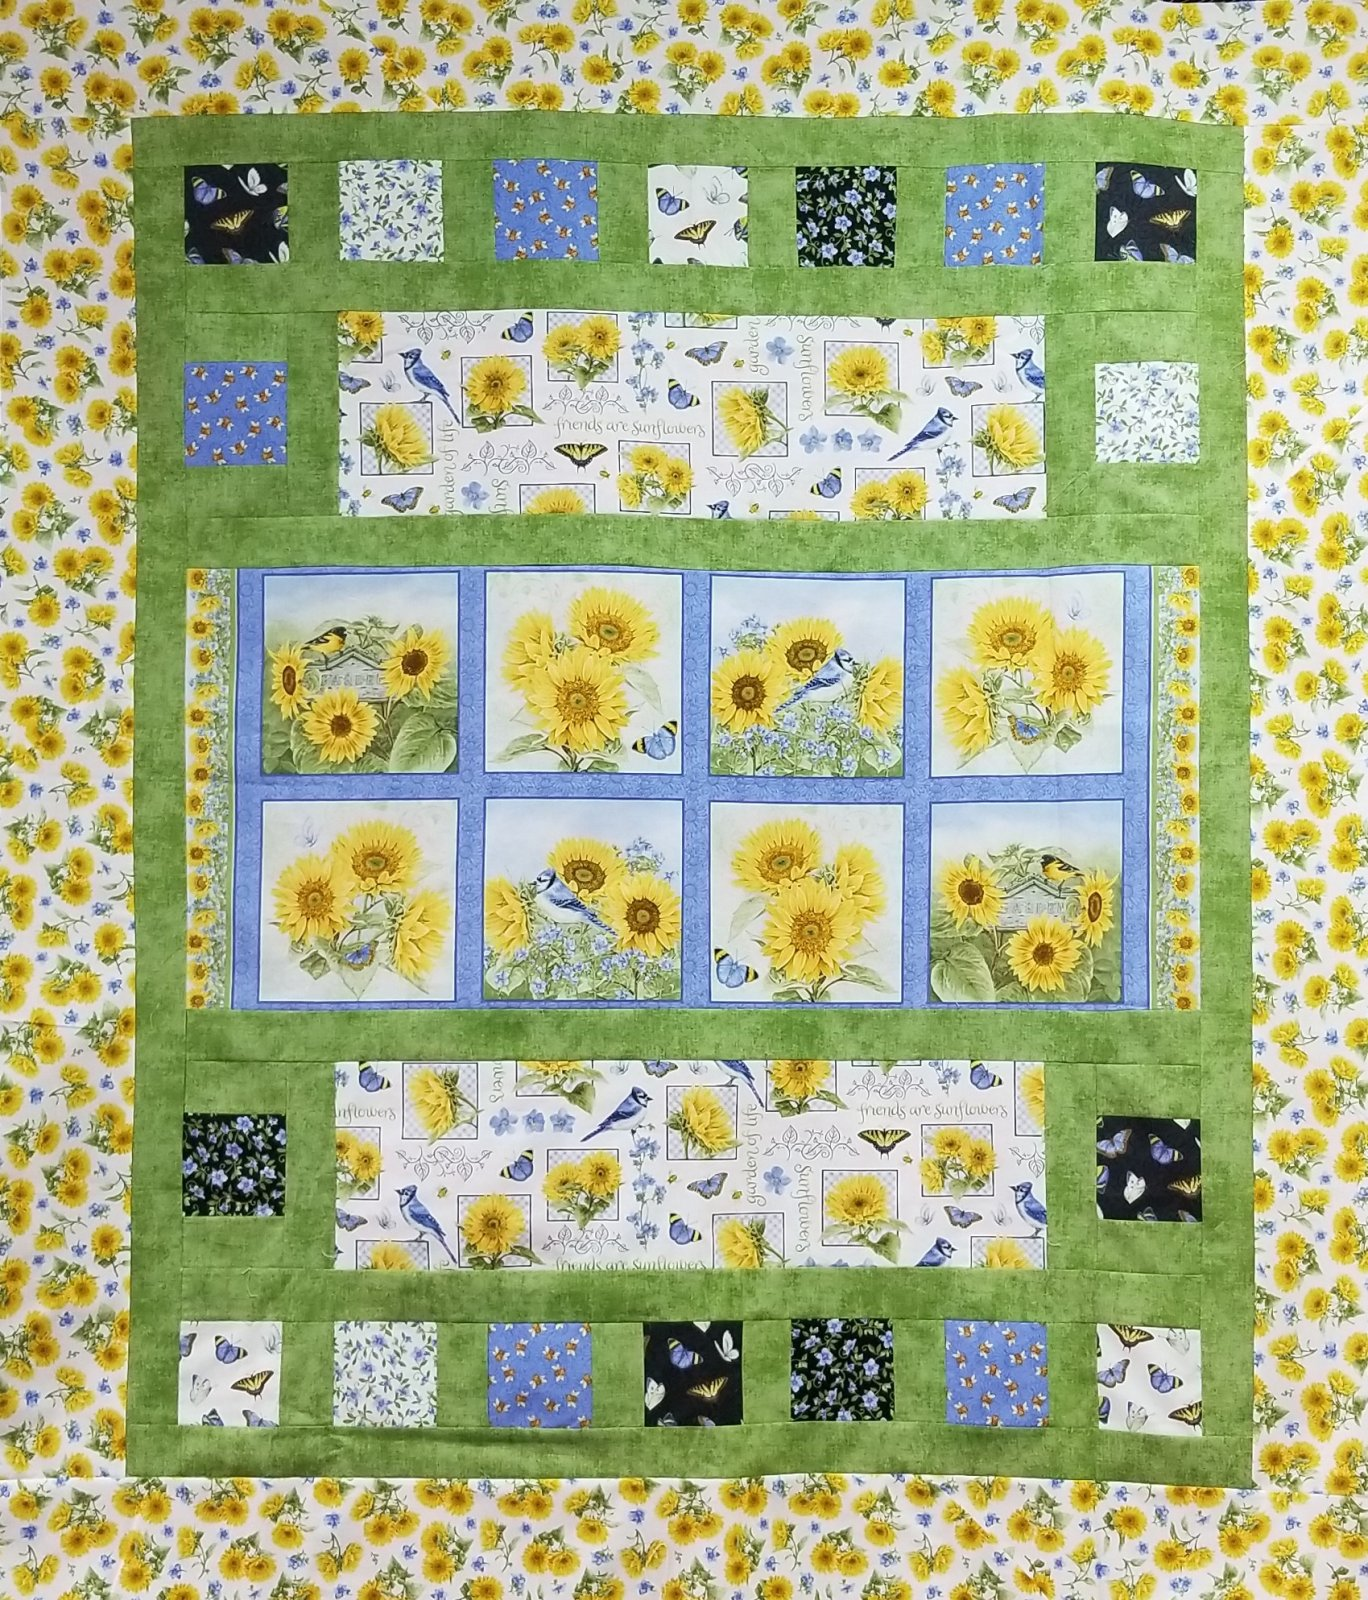 My Sunflower Garden 54.5 x 68.5 Bricks Kit